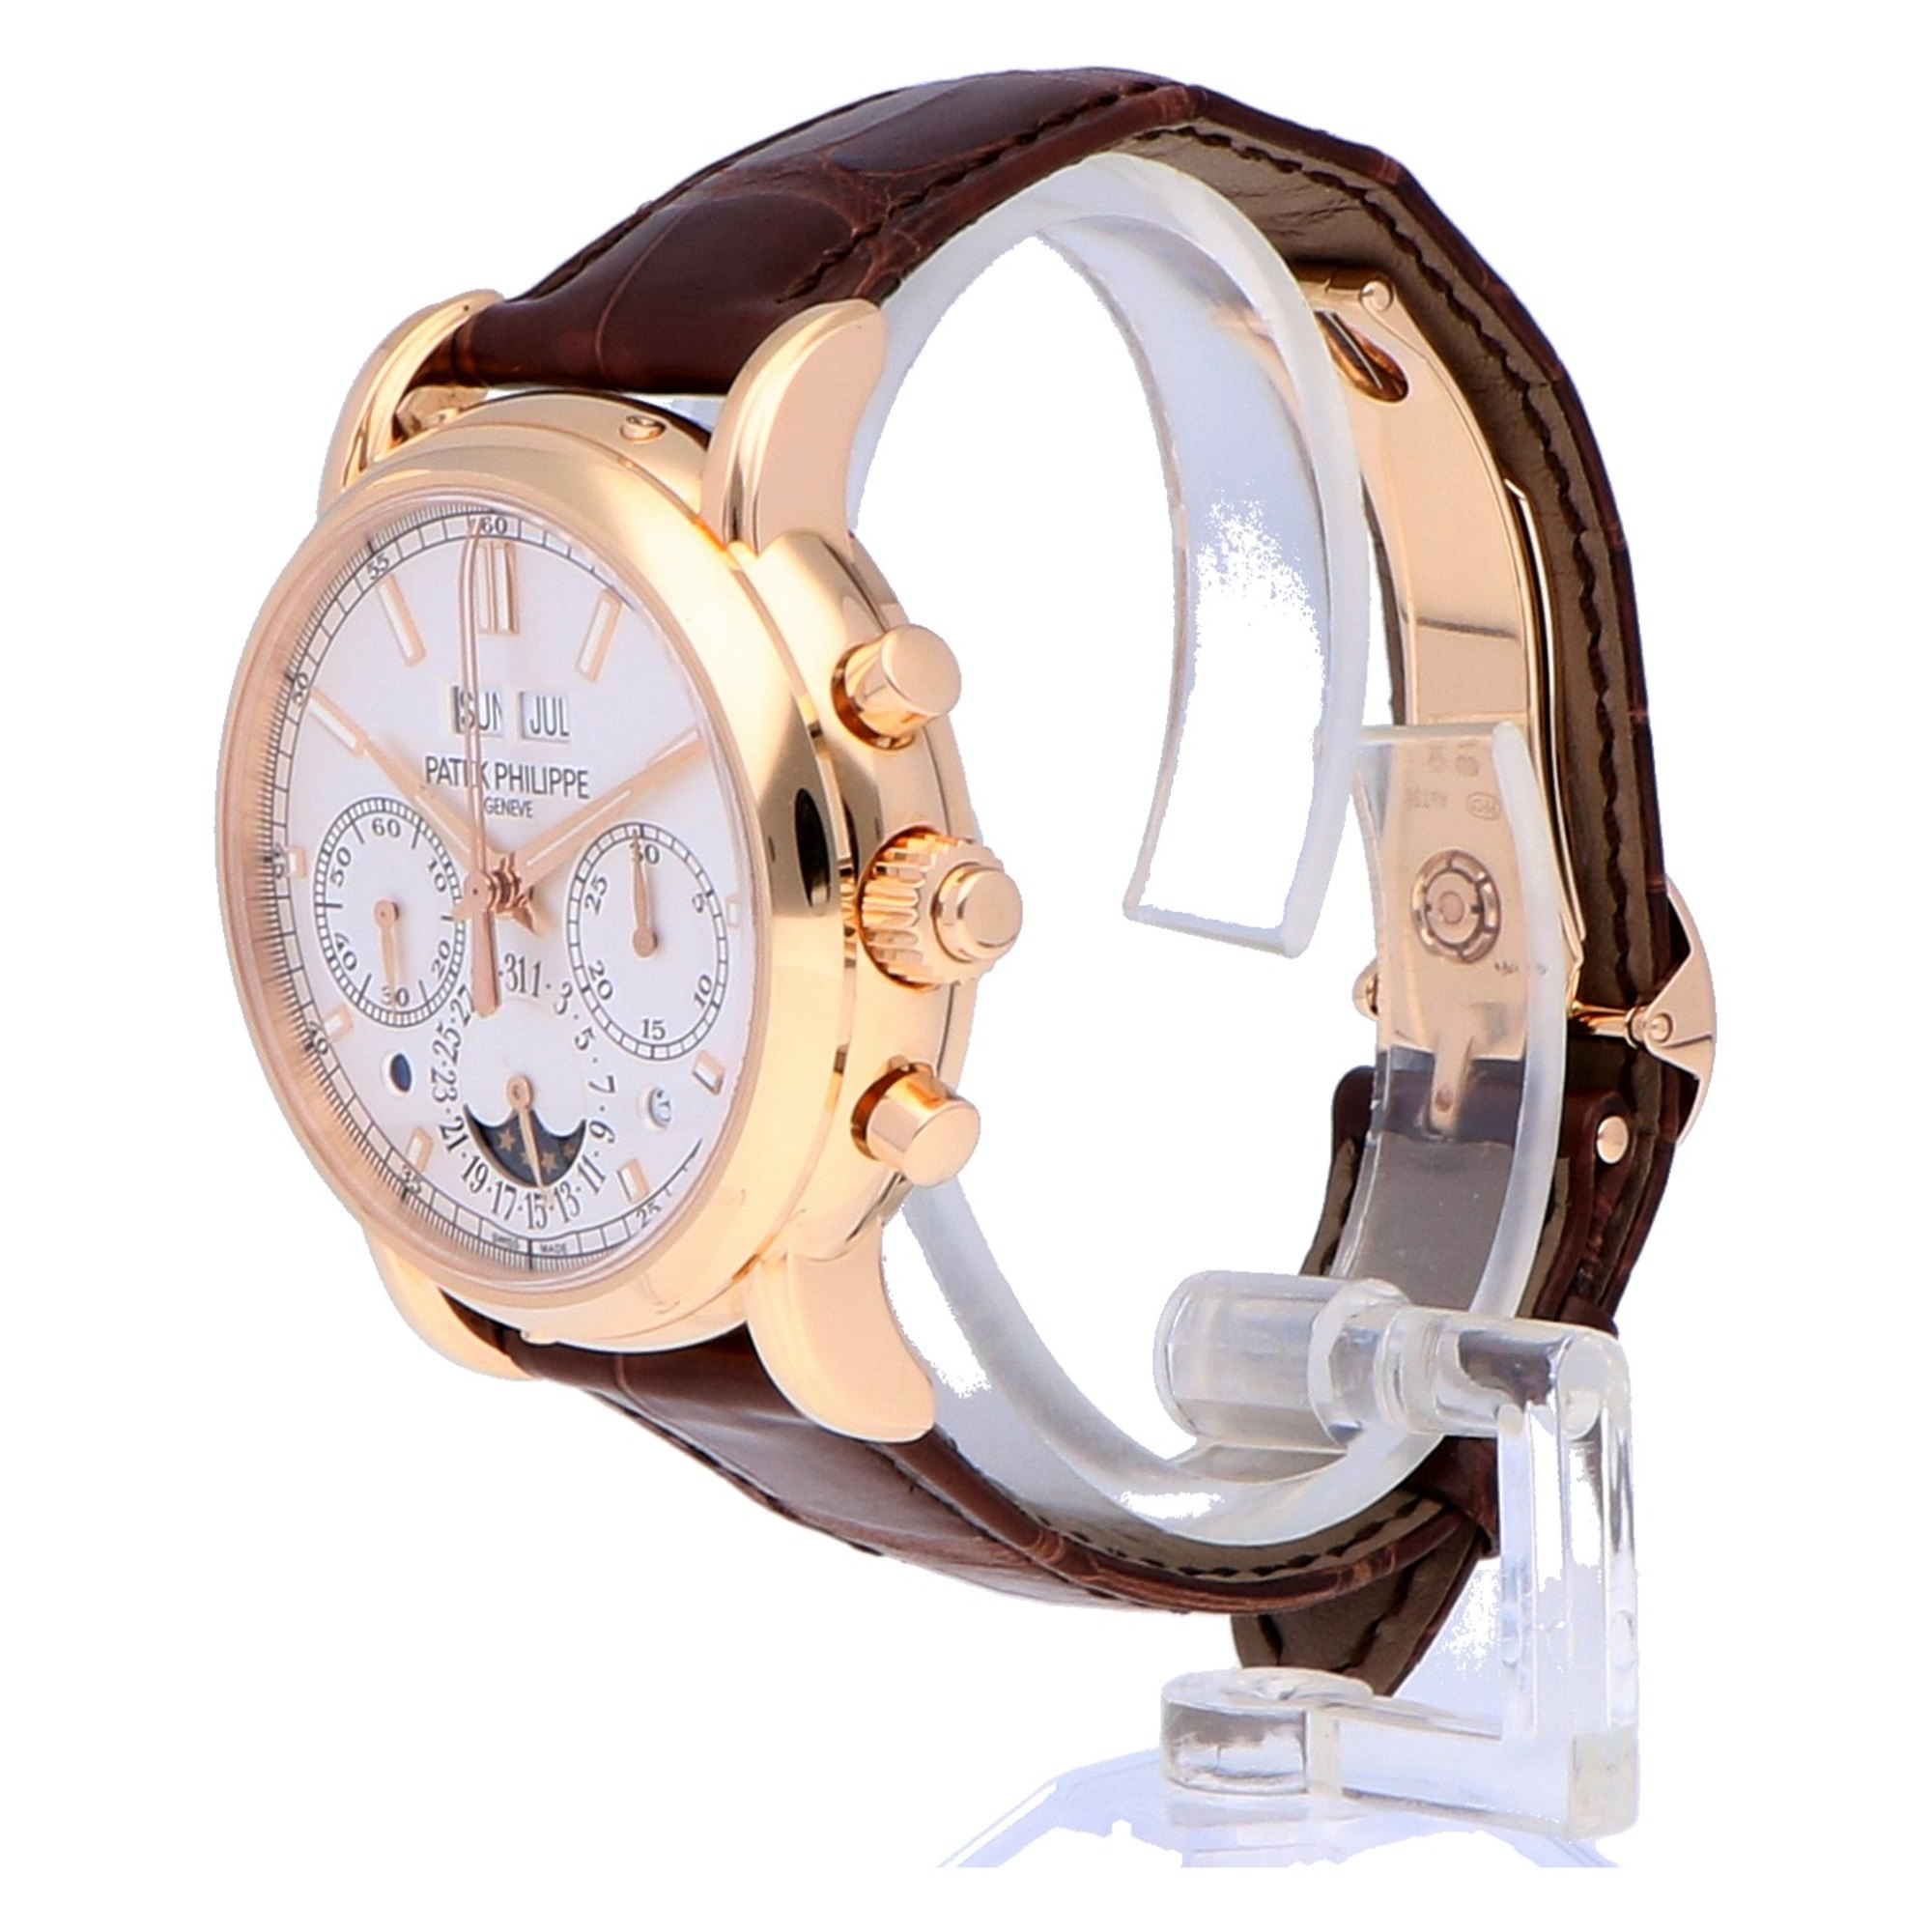 Patek Philippe Grand Complications Perpetual Calendar Chronograph 18k Rose Gold 5204R-001